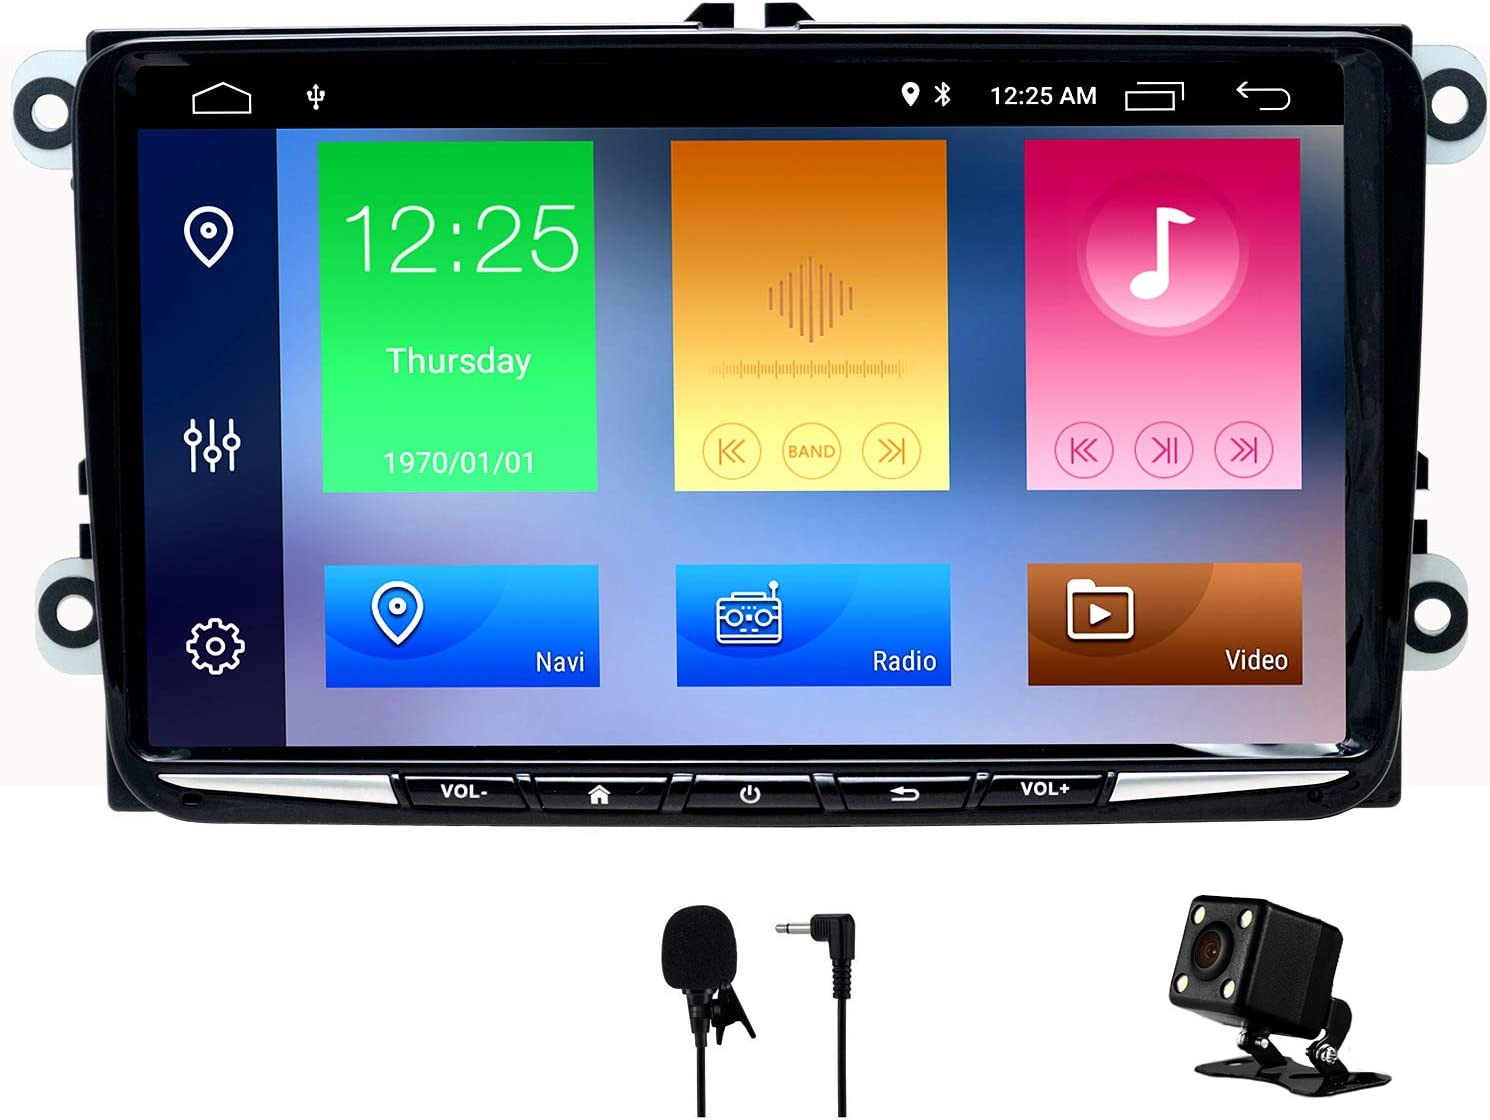 Swtnvin Android 10 0 Autoradio Stereo Headunit Passend Für Volkswagen Skoda Radio 9 Zoll Hd Touchscreen Gps Navigation Mit Bluetooth Wifi Lenkradsteuerung 2 Gb 32 Gb Dünn Navigation